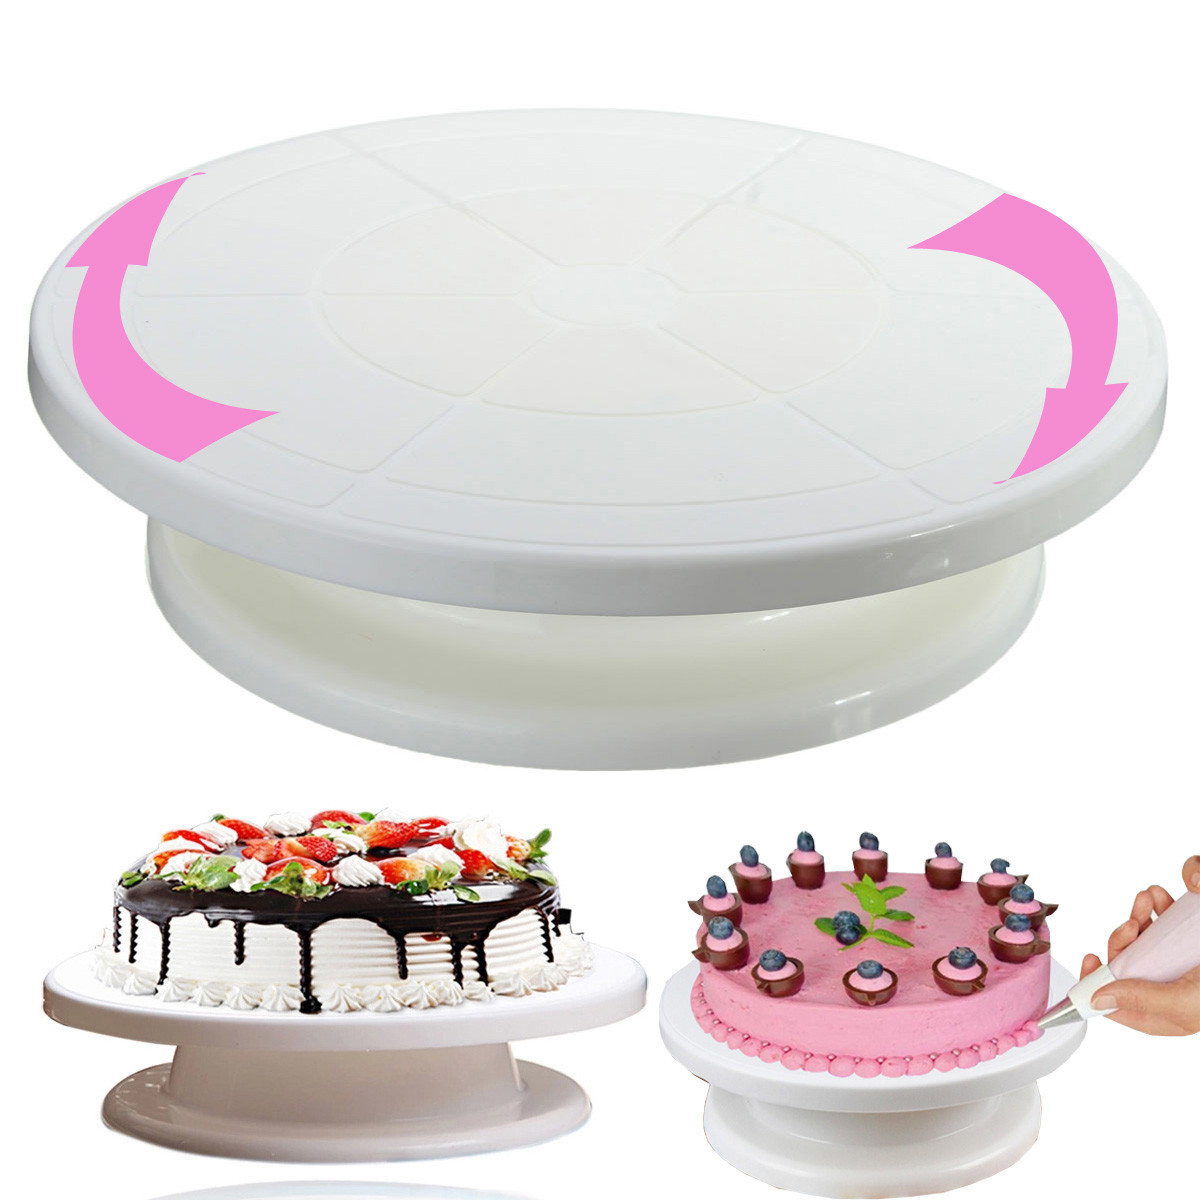 "Cake Decorating Rotating Revolving Icing Turntable Stand Shelf Kitchen Bakeware Cake Cupcake Display Tools 11""28cm(China (Mainland))"